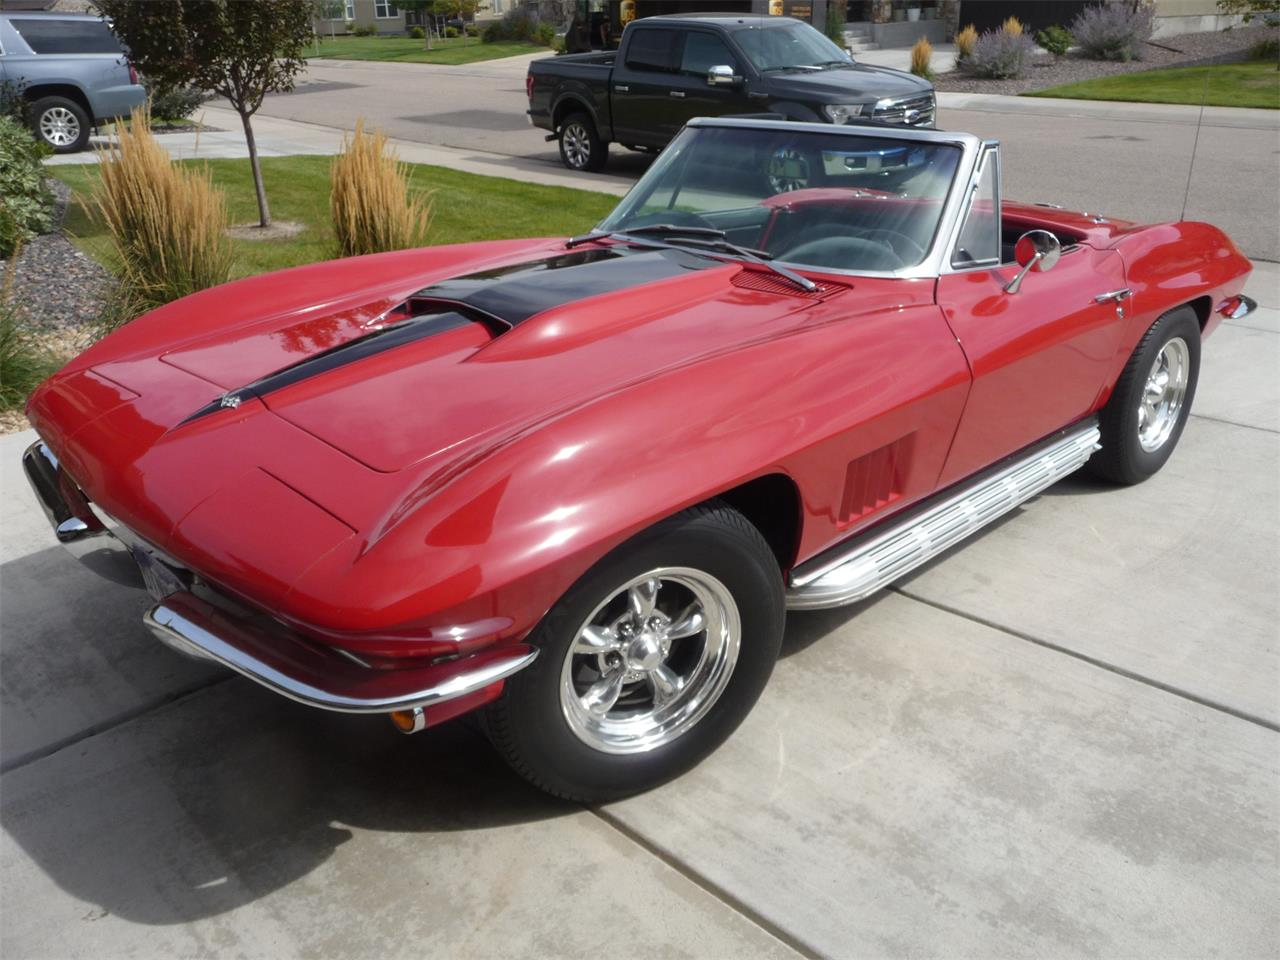 Large Picture of 1967 Corvette located in WINDSOR Colorado - $55,000.00 - OJOQ